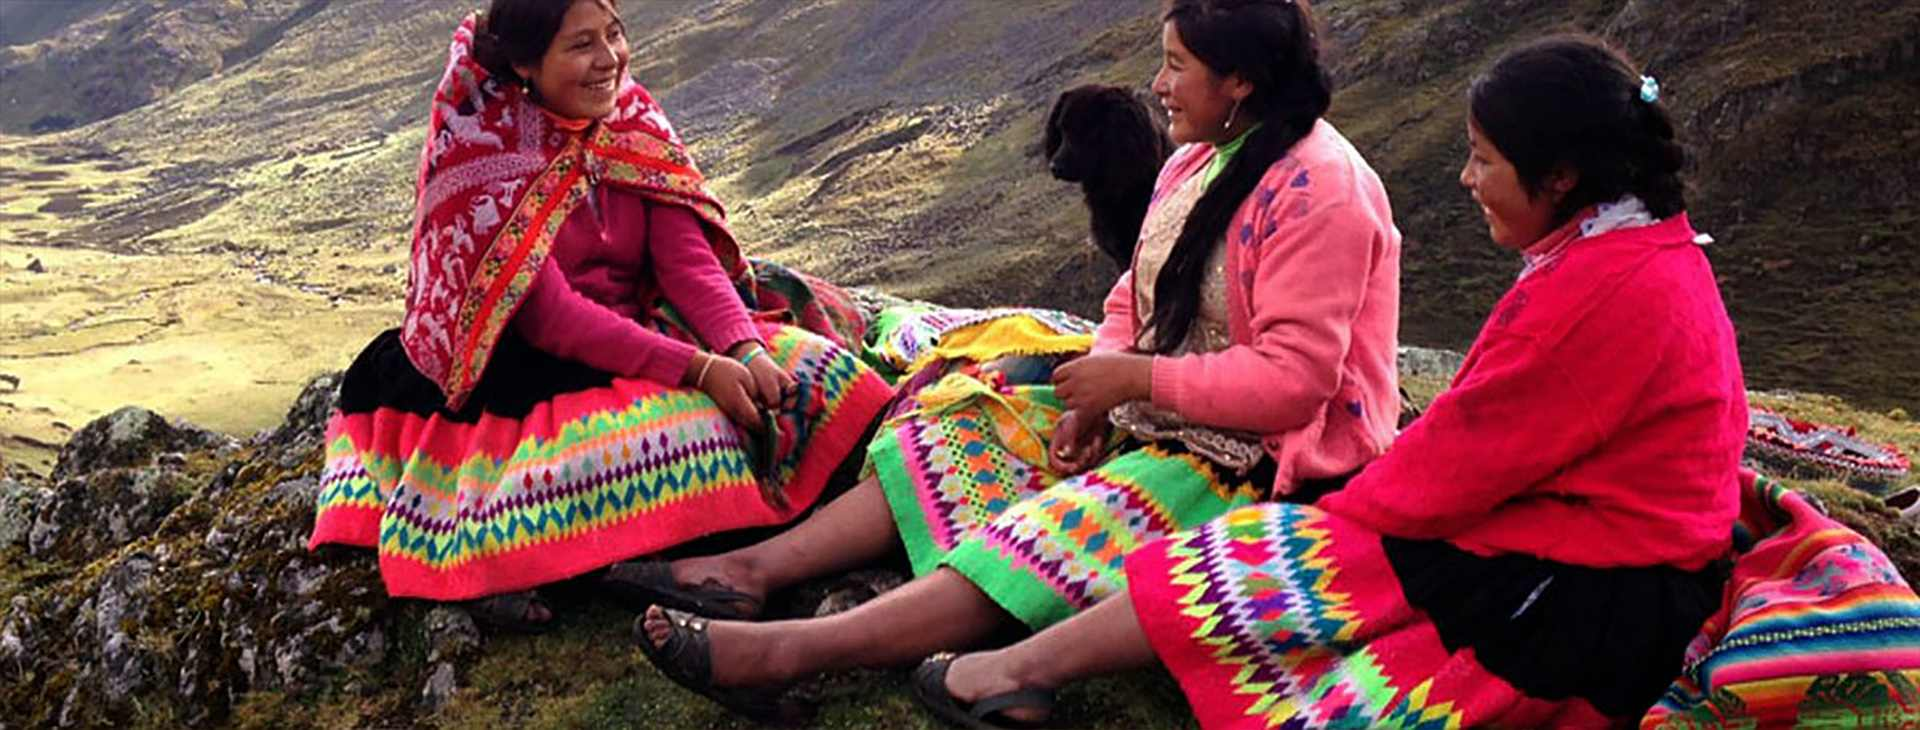 Tour Valle de Lares Trek y Machu picchu 4dias - TOURS PERU MACHU PICCHU